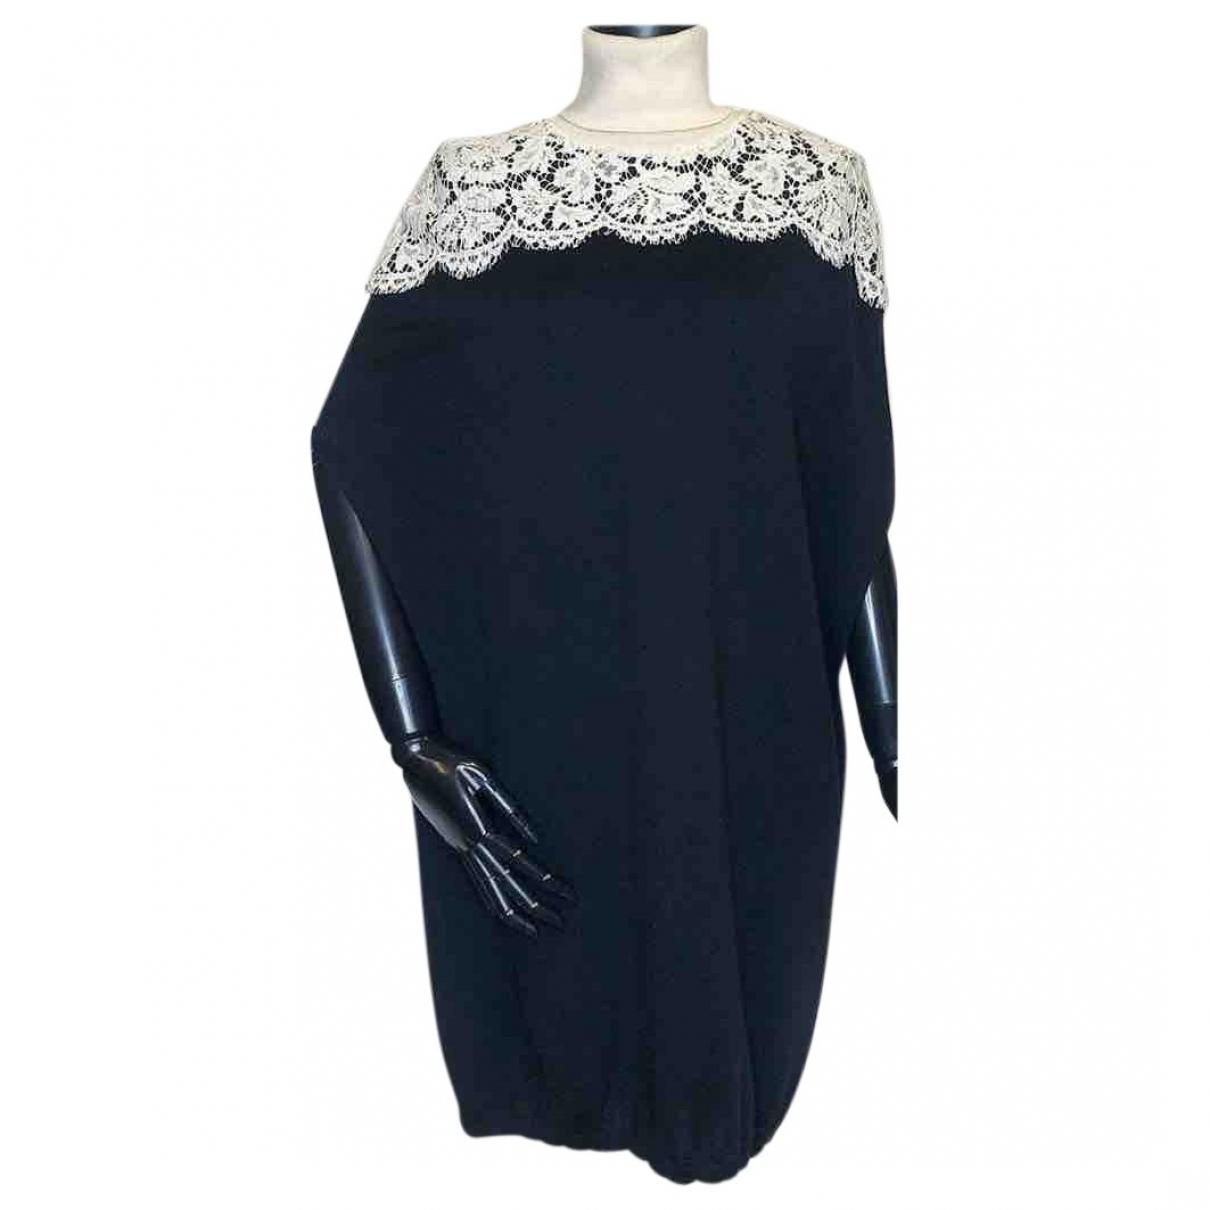 Valentino Garavani \N Black Wool dress for Women 42 IT